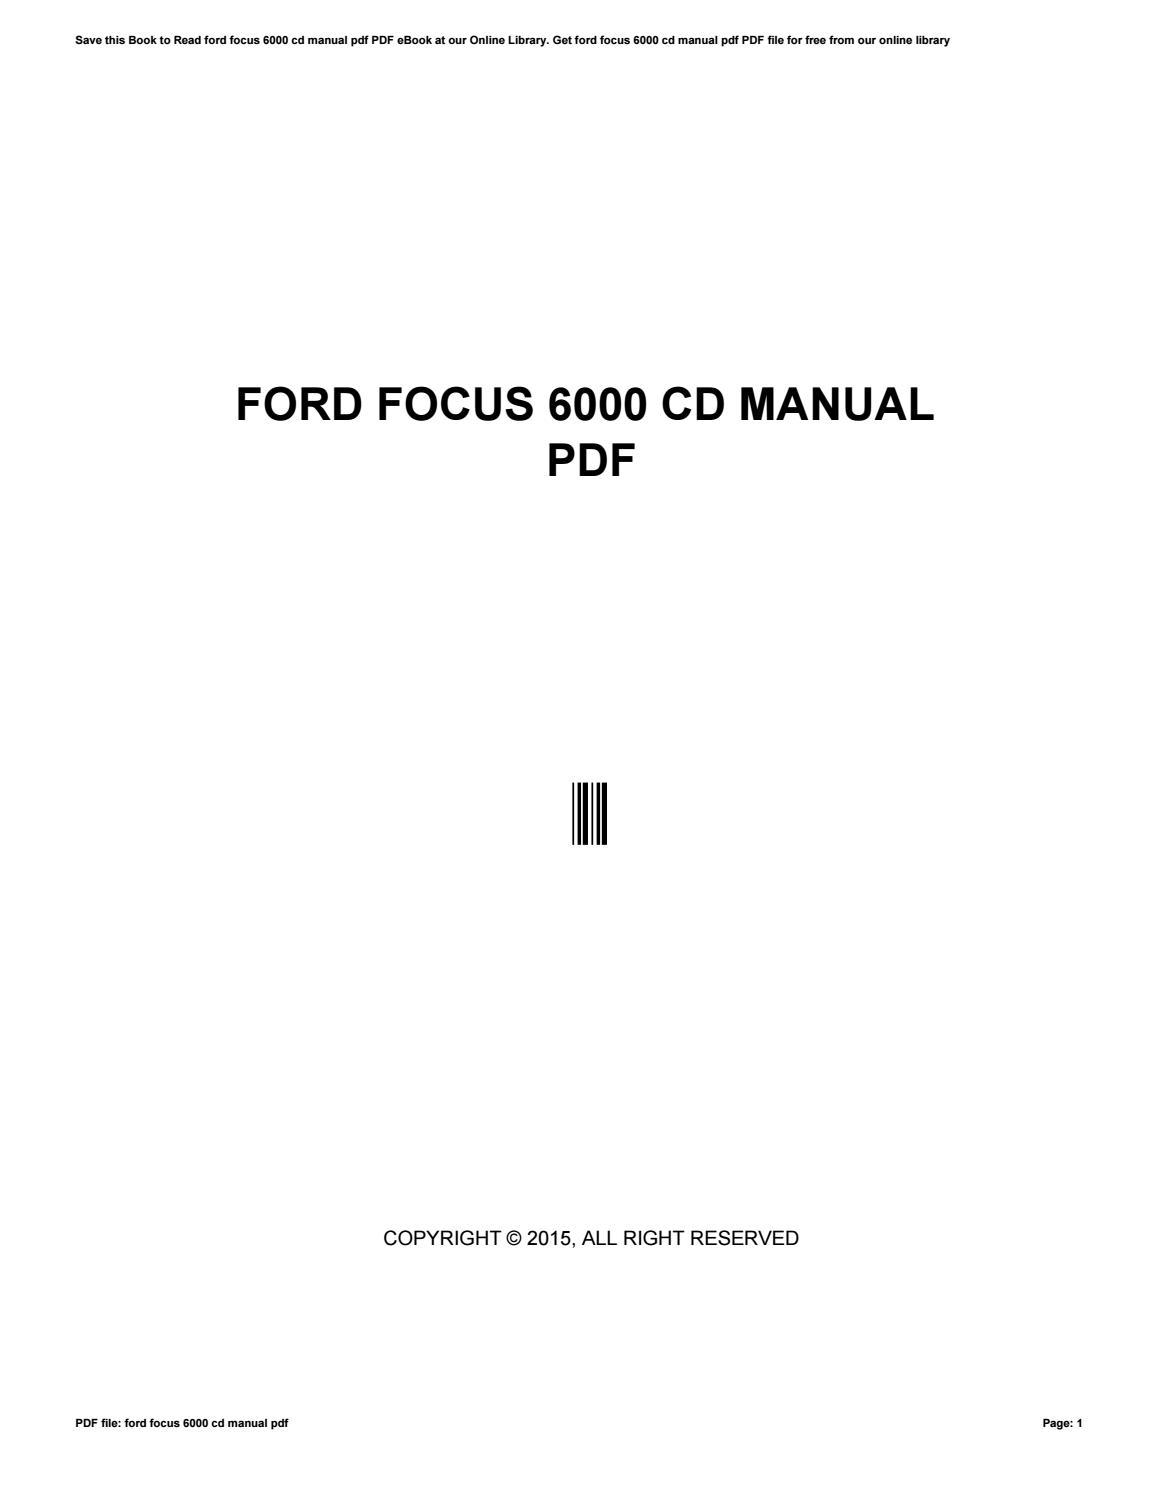 Ford Lsg Service Manual Ebook E550 E 150 Wiring Diagram Manuals Array Au Falcon Workshop Rh Topmalawis De